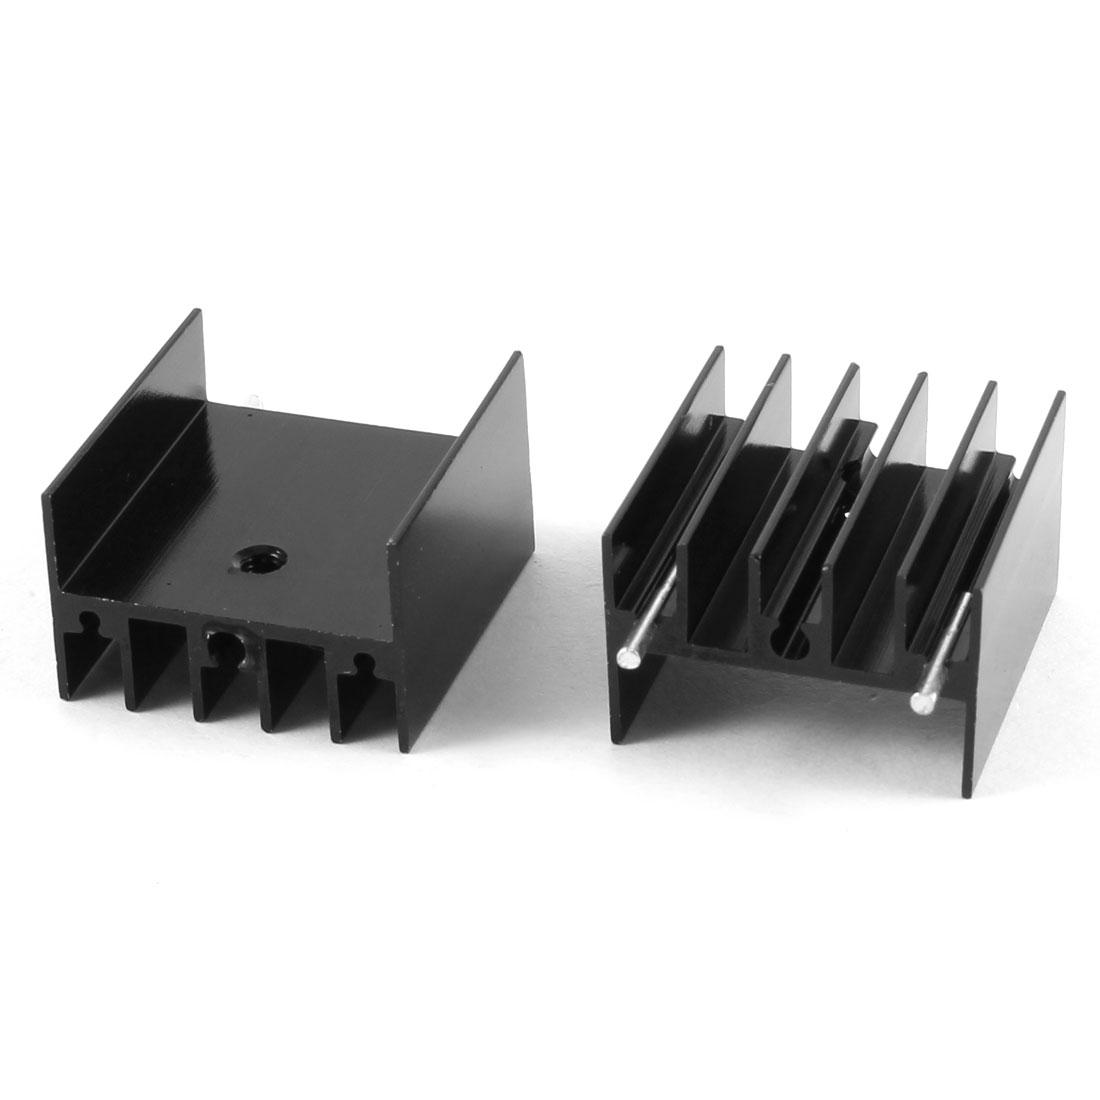 2 Pcs 25mm x 23mm x 15mm Aluminium Heatsink Radiating Cooler Cooling Fin Black